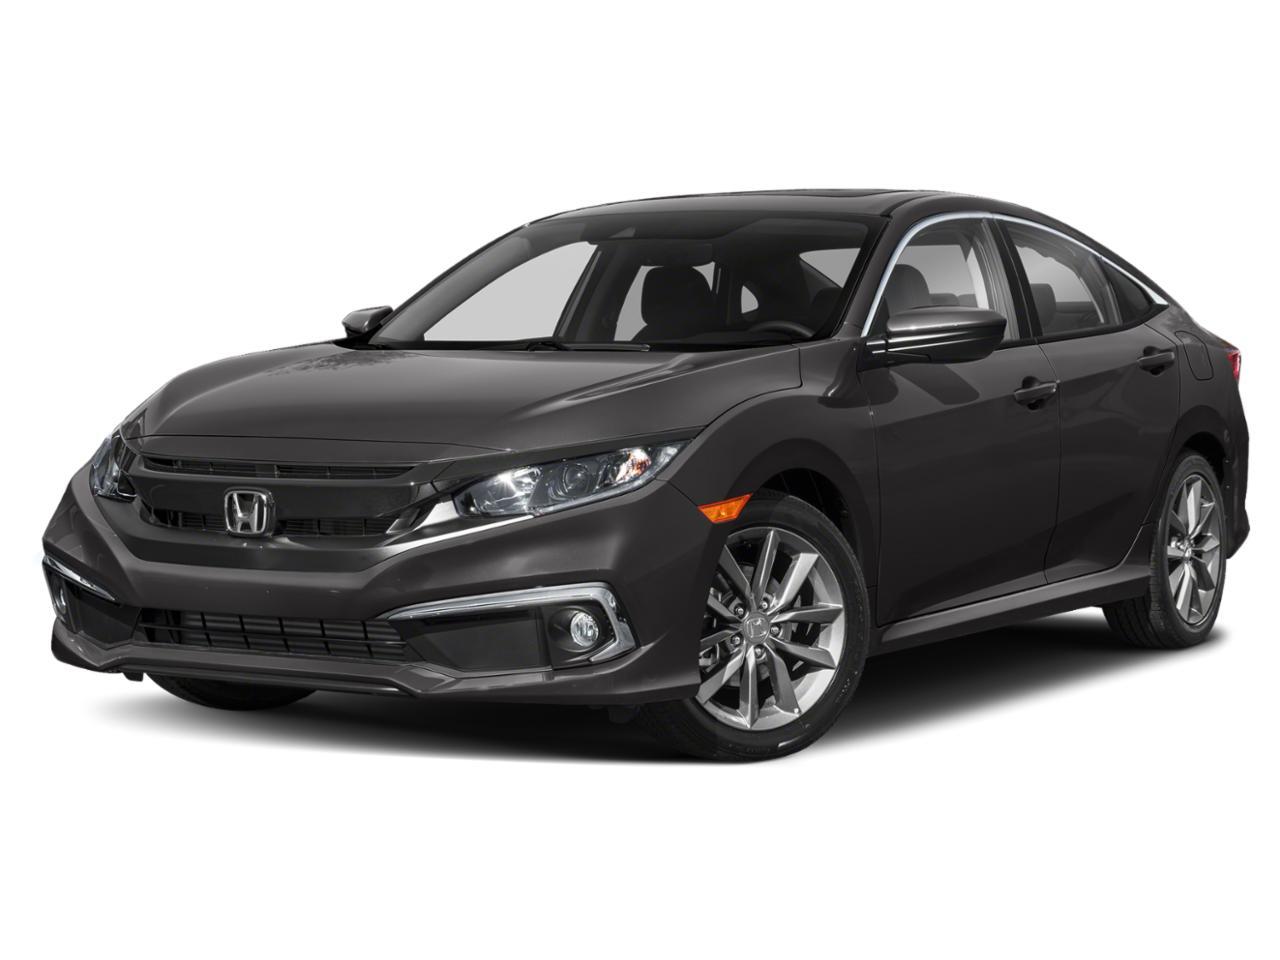 2020 Honda Civic Sedan Vehicle Photo in San Antonio, TX 78238